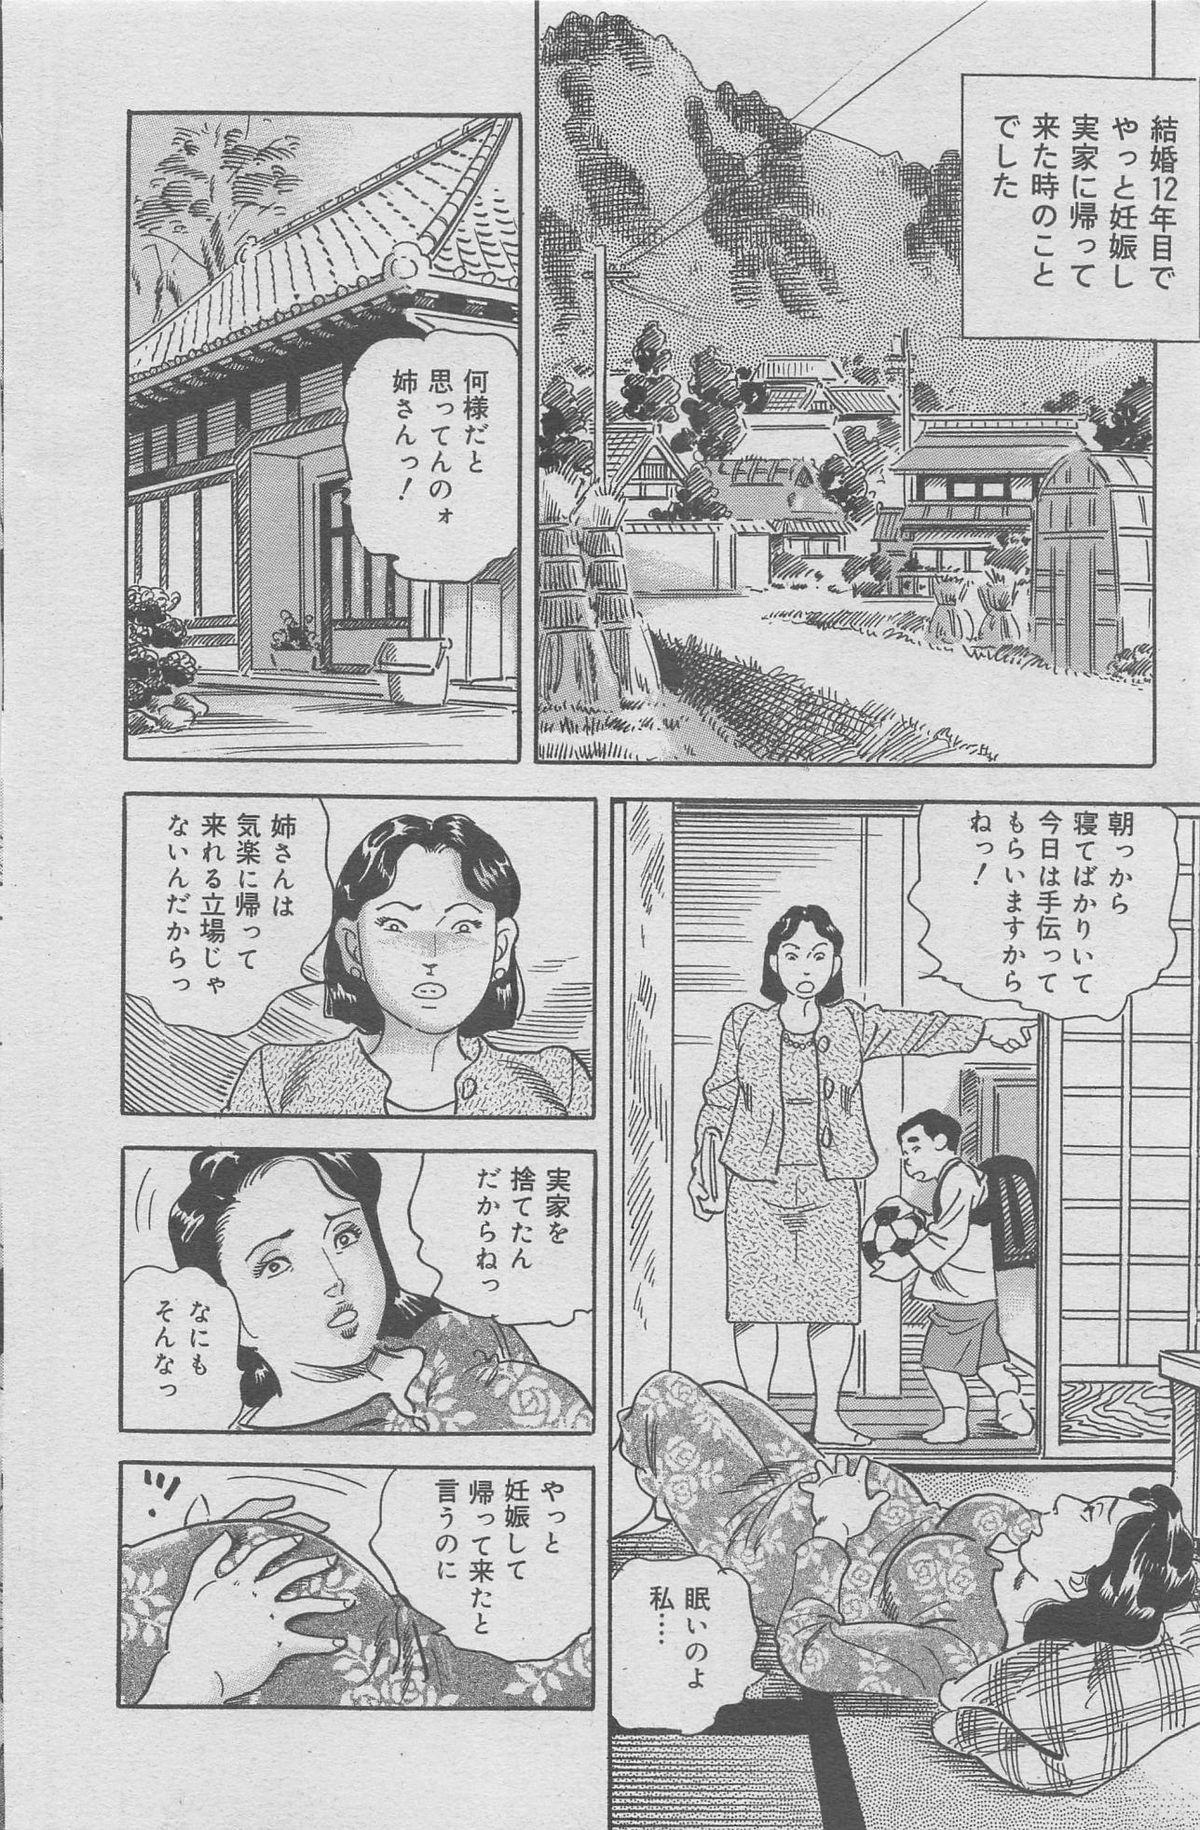 Hontou ni Atta Kindanai vol.7 83